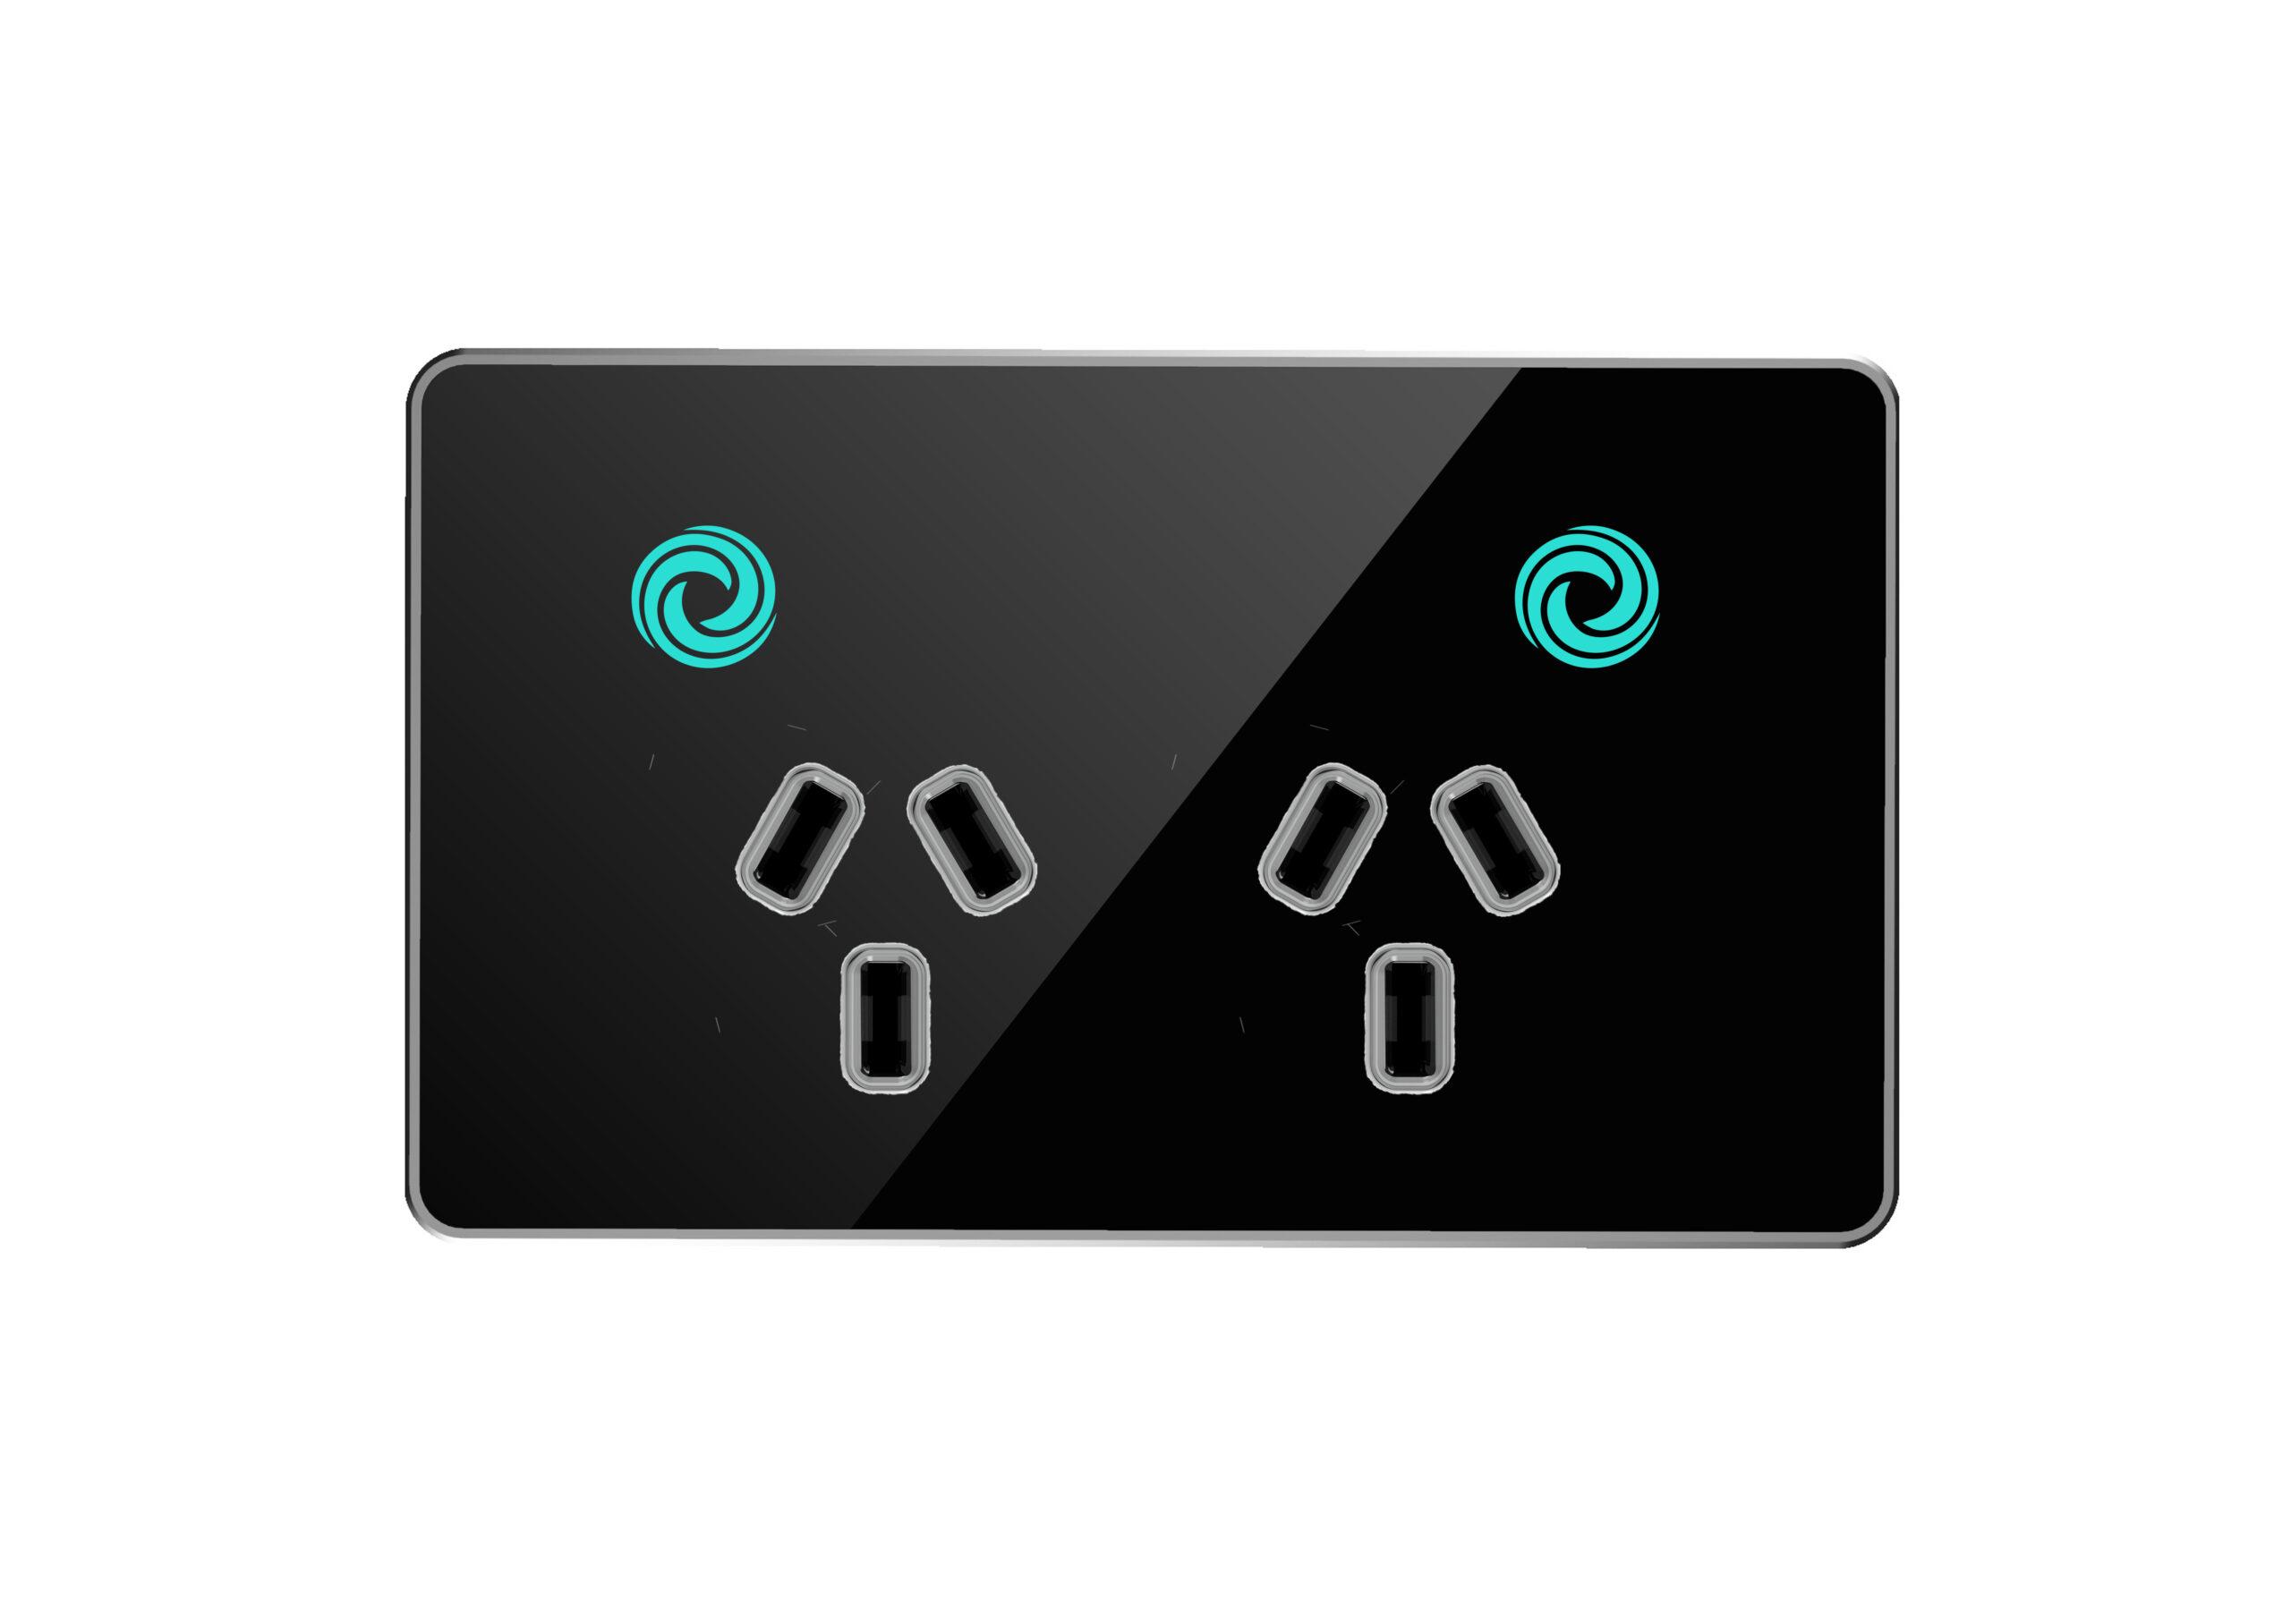 Interfree ZigBee Smart Power Point